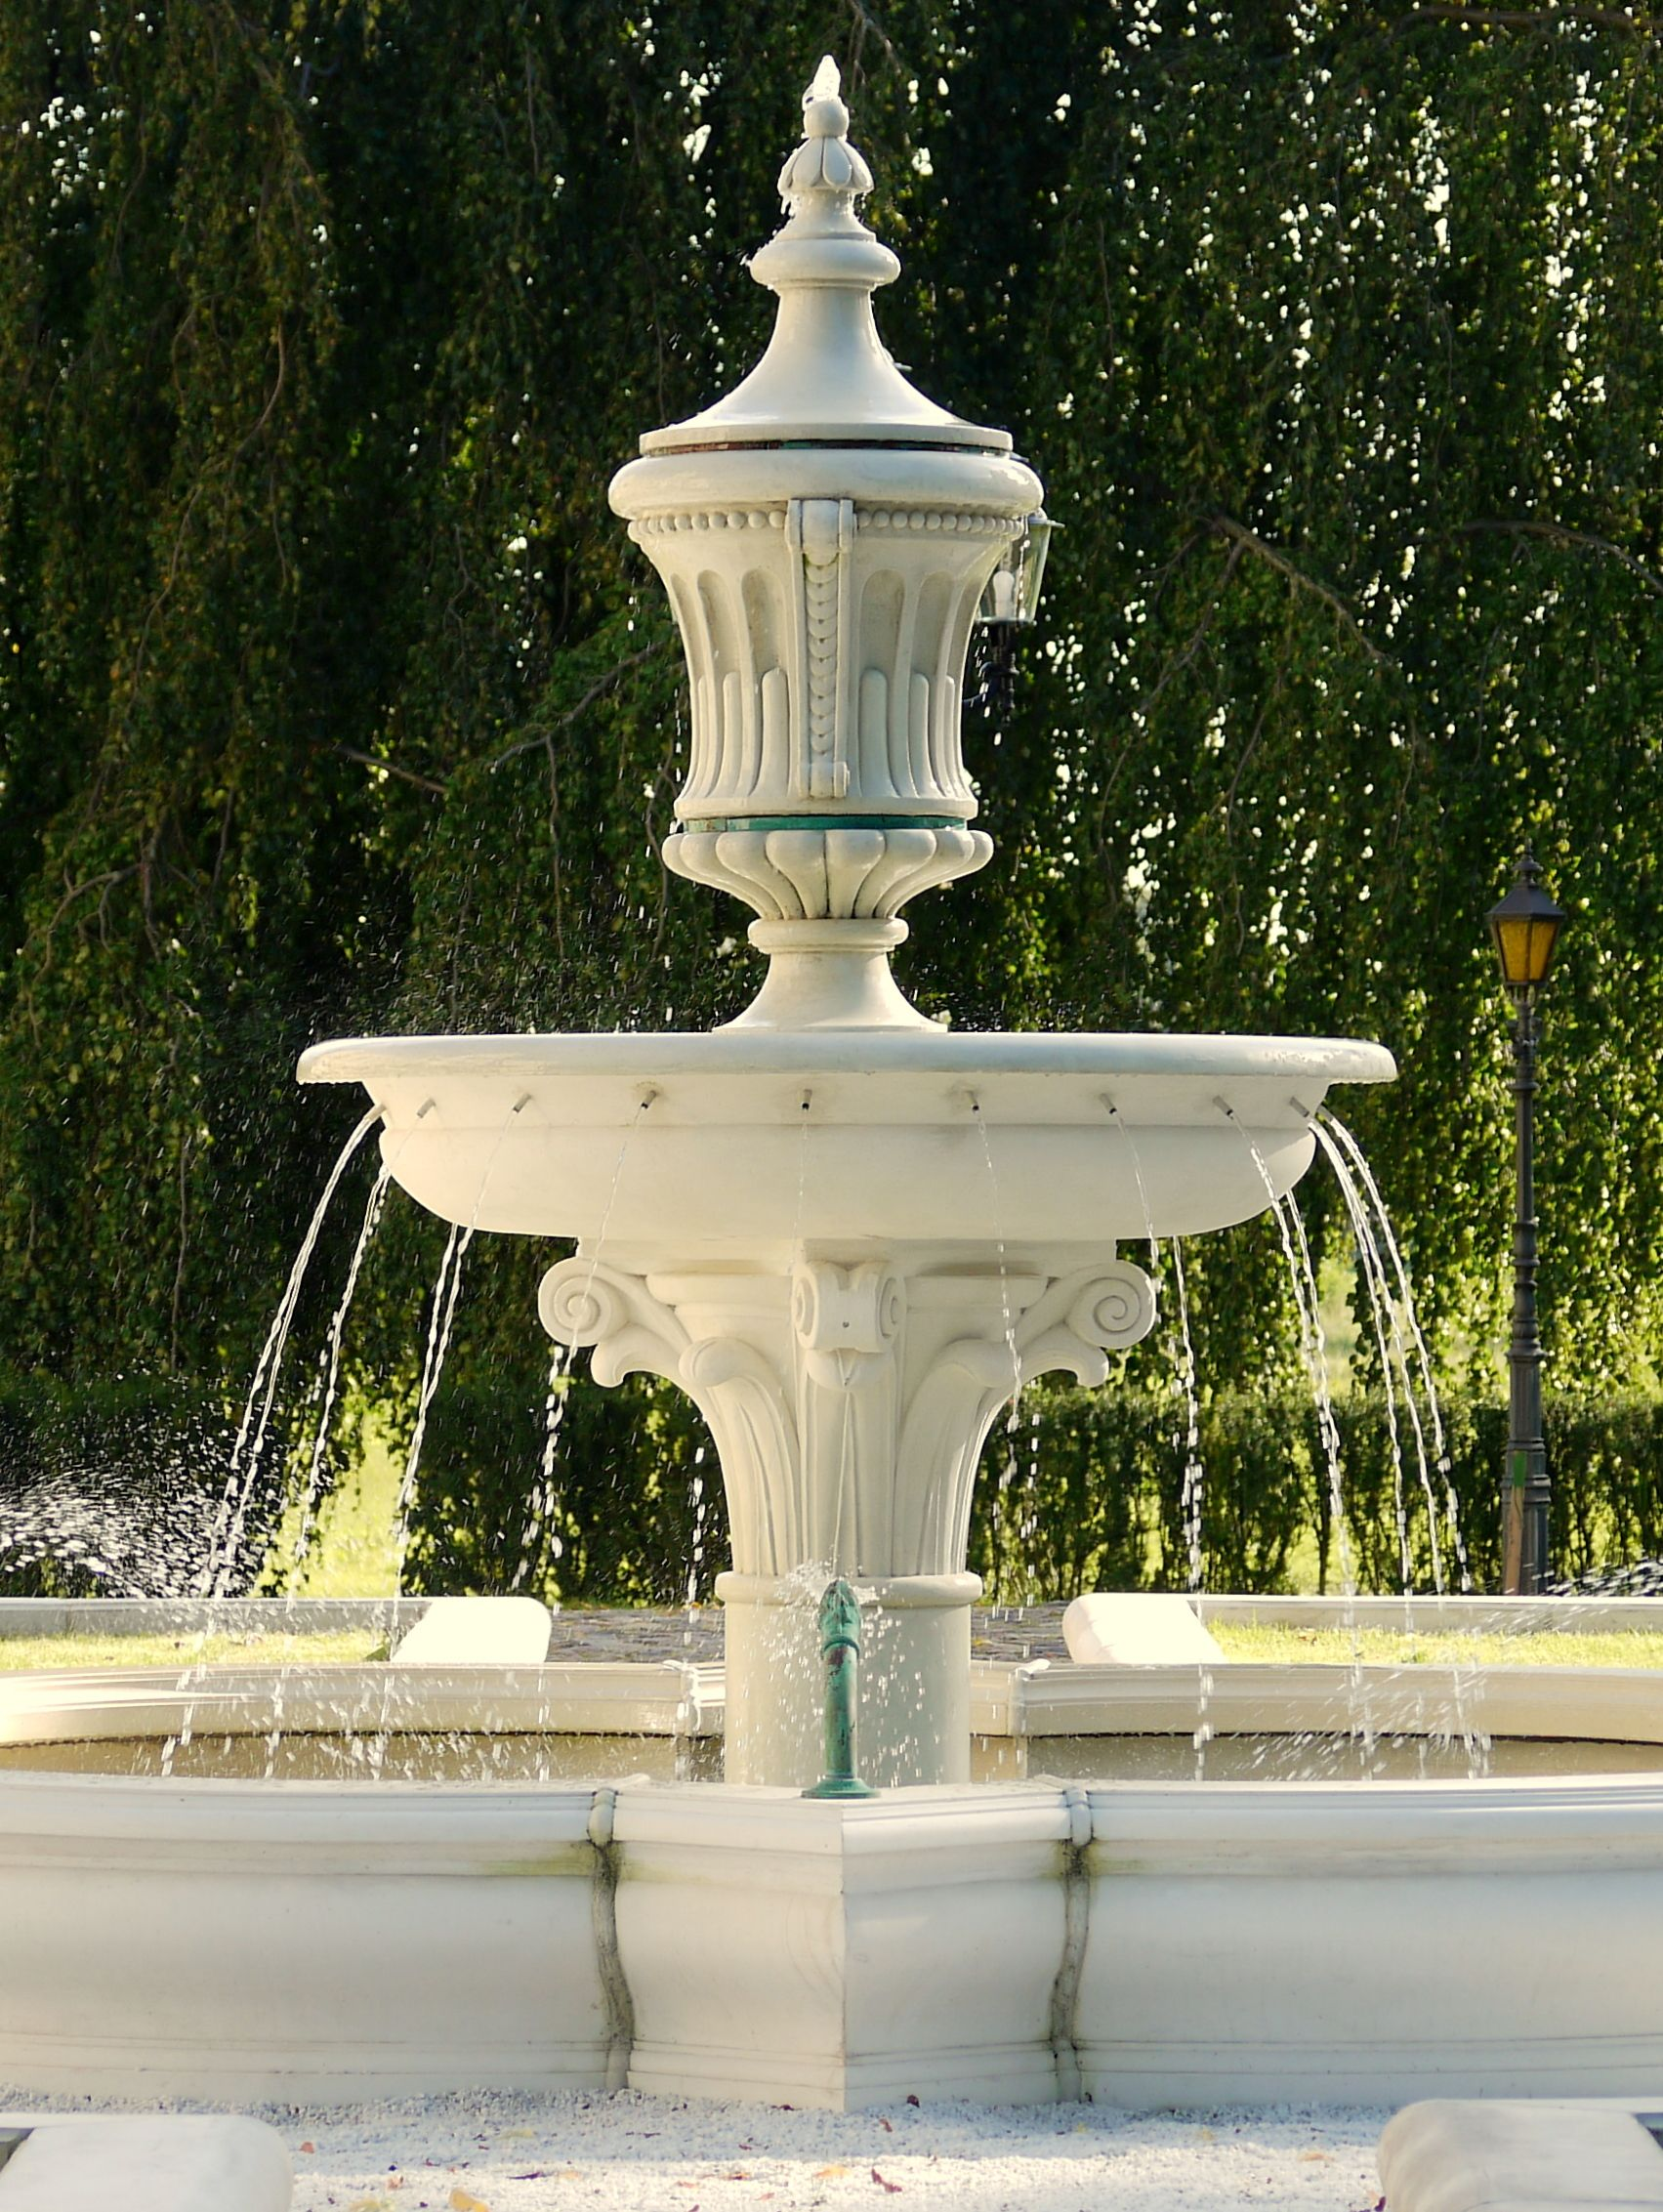 Garten Springbrunnen Trax Matthies #brunnen #fountain #kunststein Beauty Fountains Pinterest  ~ 28035815_Springbrunnen Garten Gebraucht